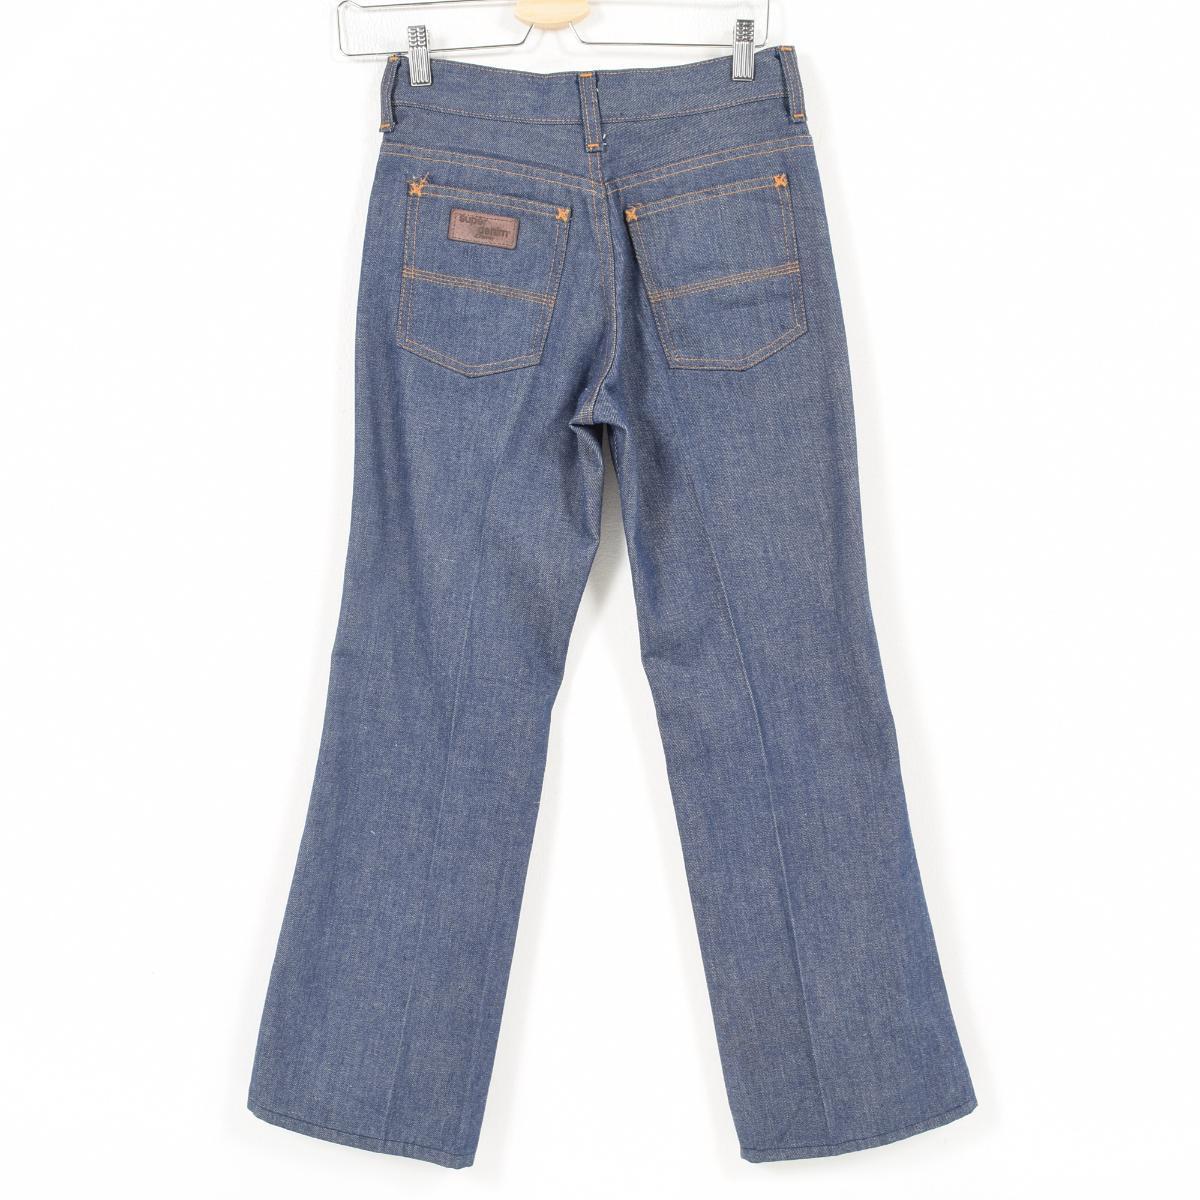 5d2688c5501 70s Jay sea penny J.C.Penney super denim long underwear Lady's M(w28)  vintage /wal4839